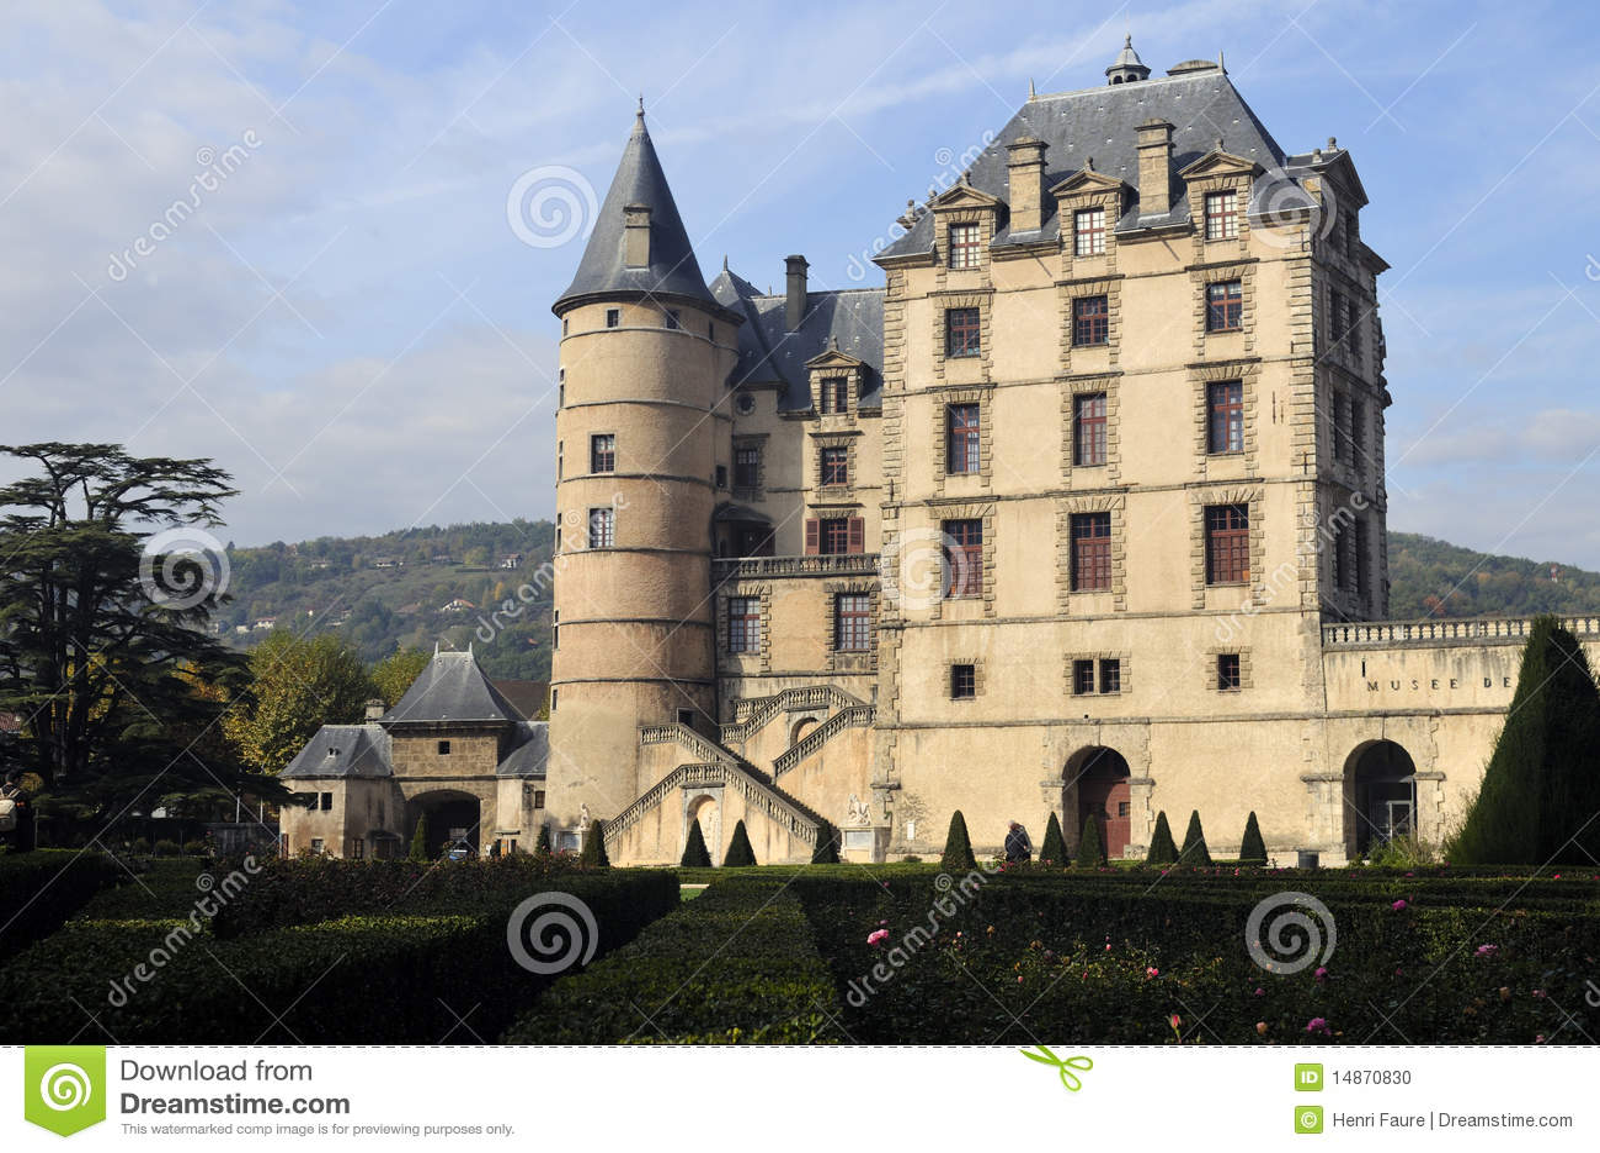 the castle of vizille near grenoble france stock photo image 14870830. Black Bedroom Furniture Sets. Home Design Ideas